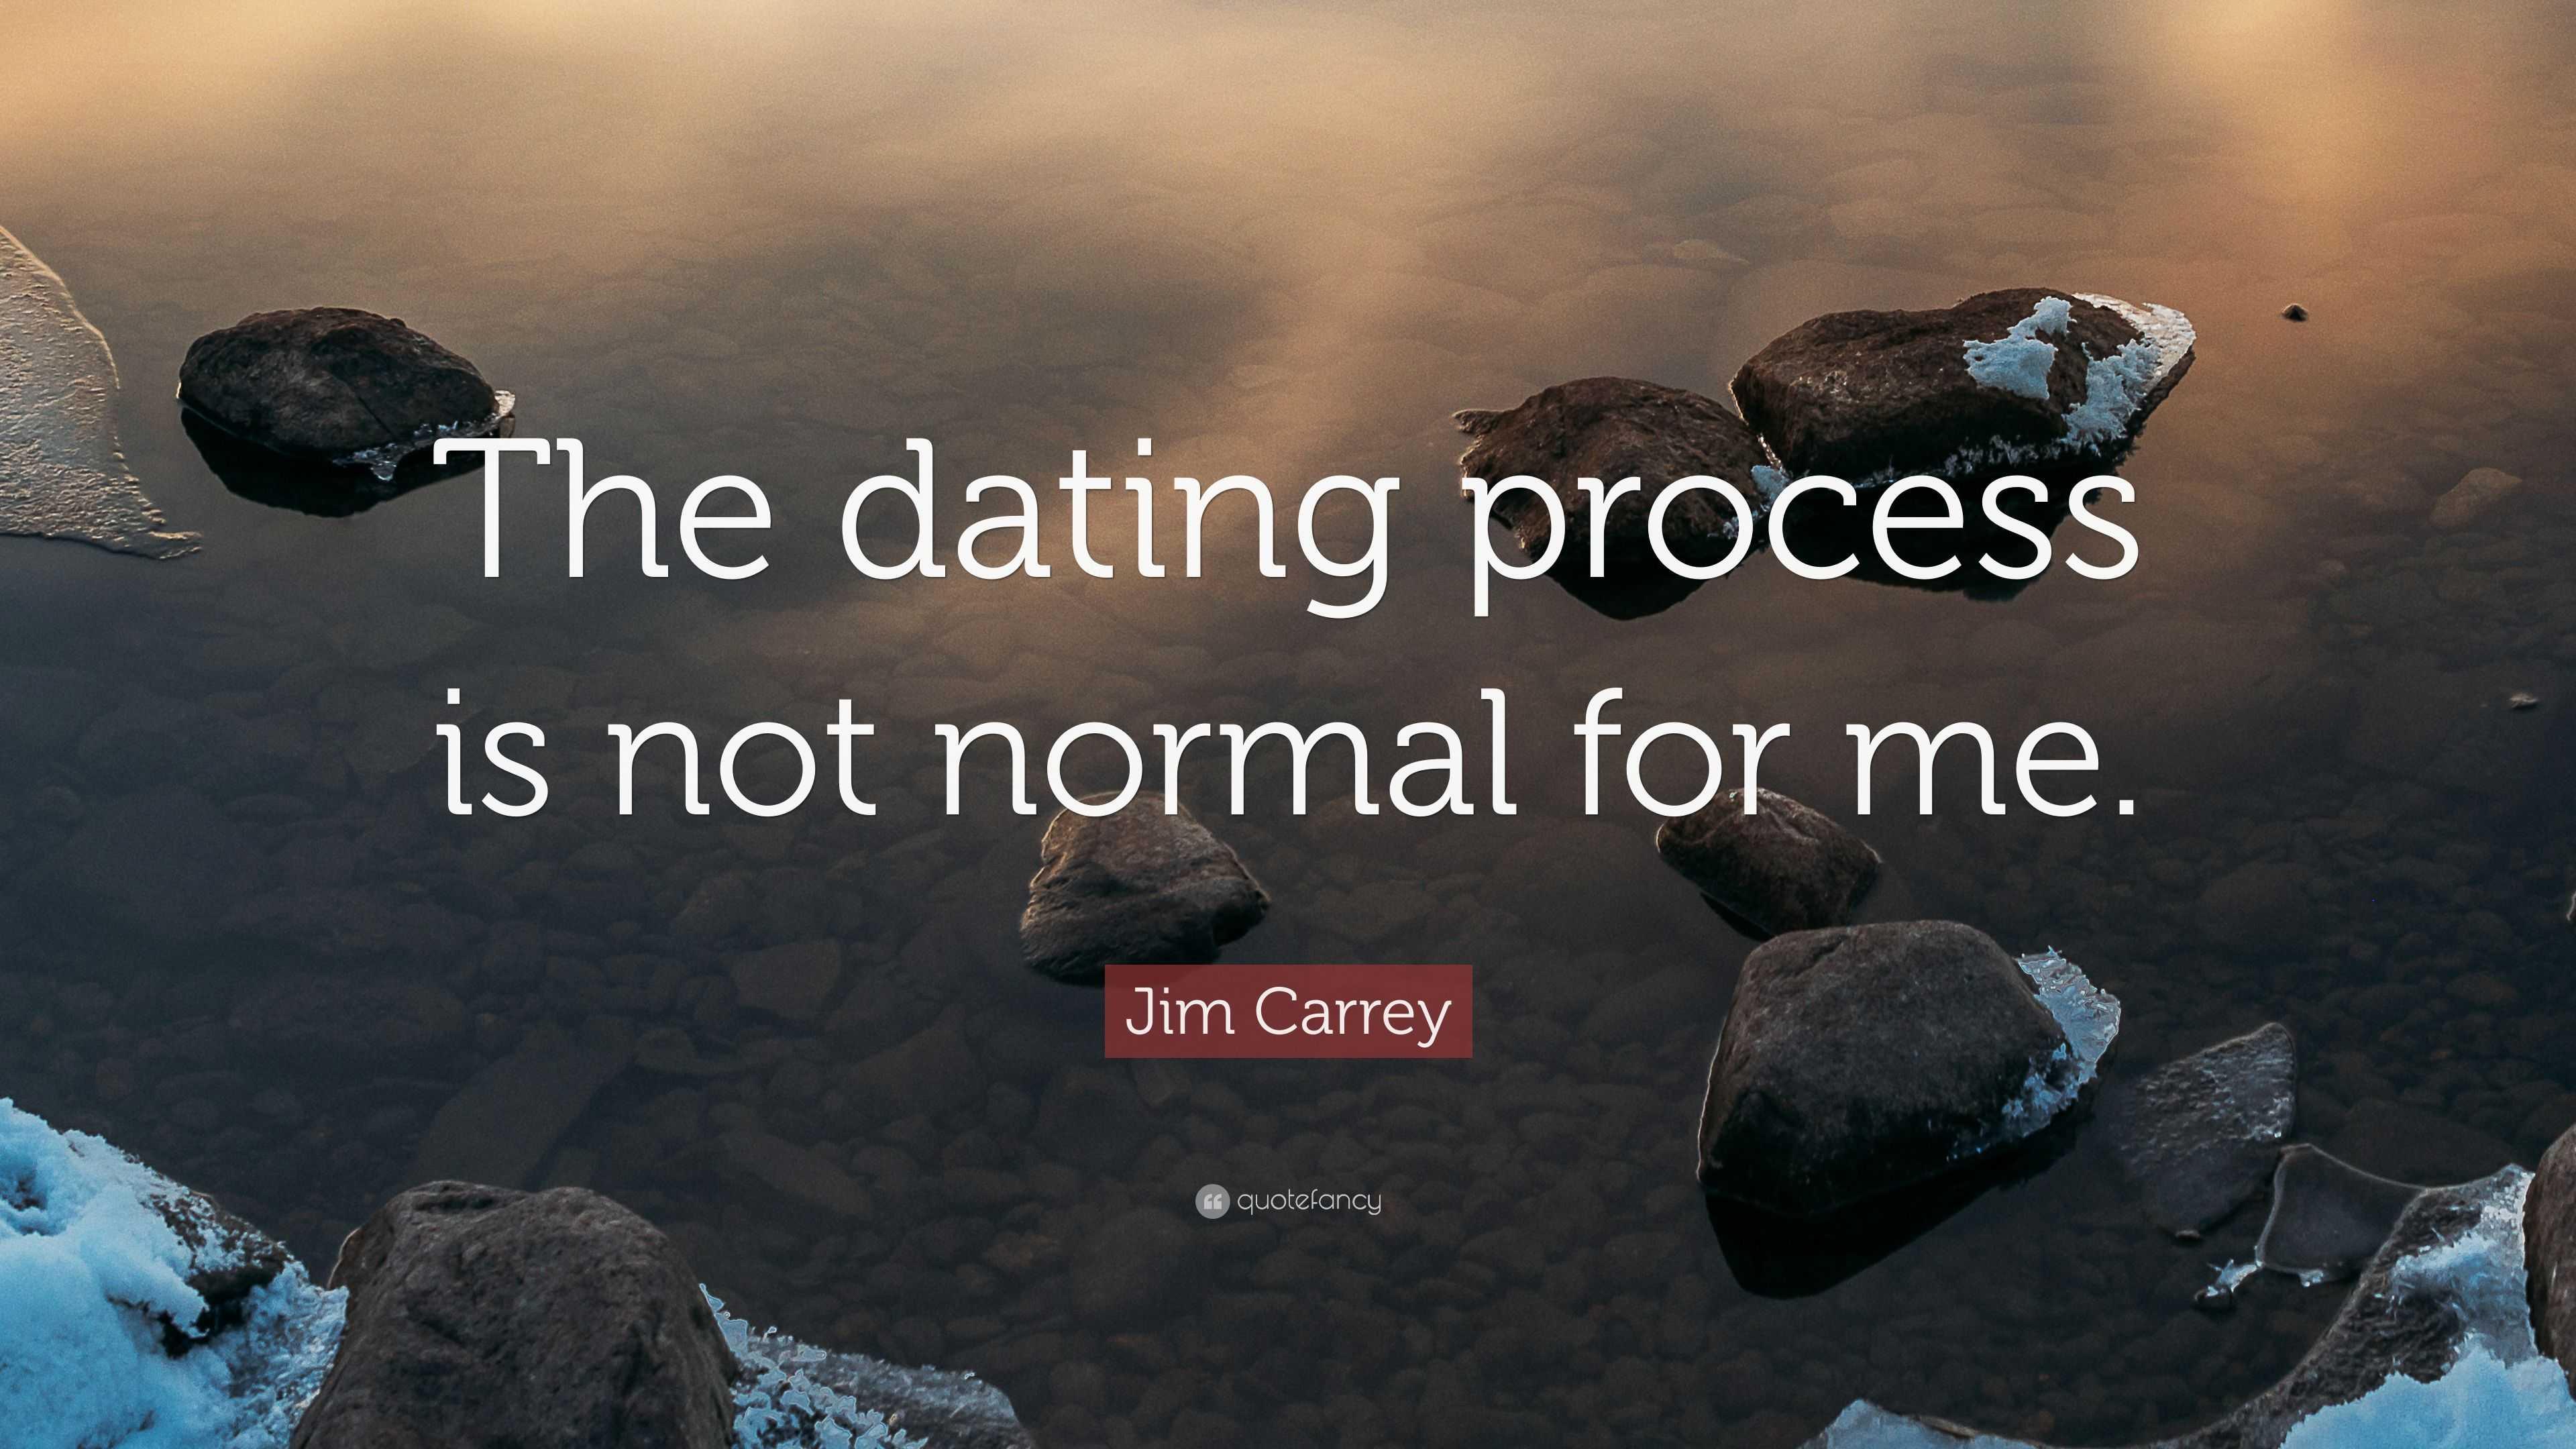 Online venner dating